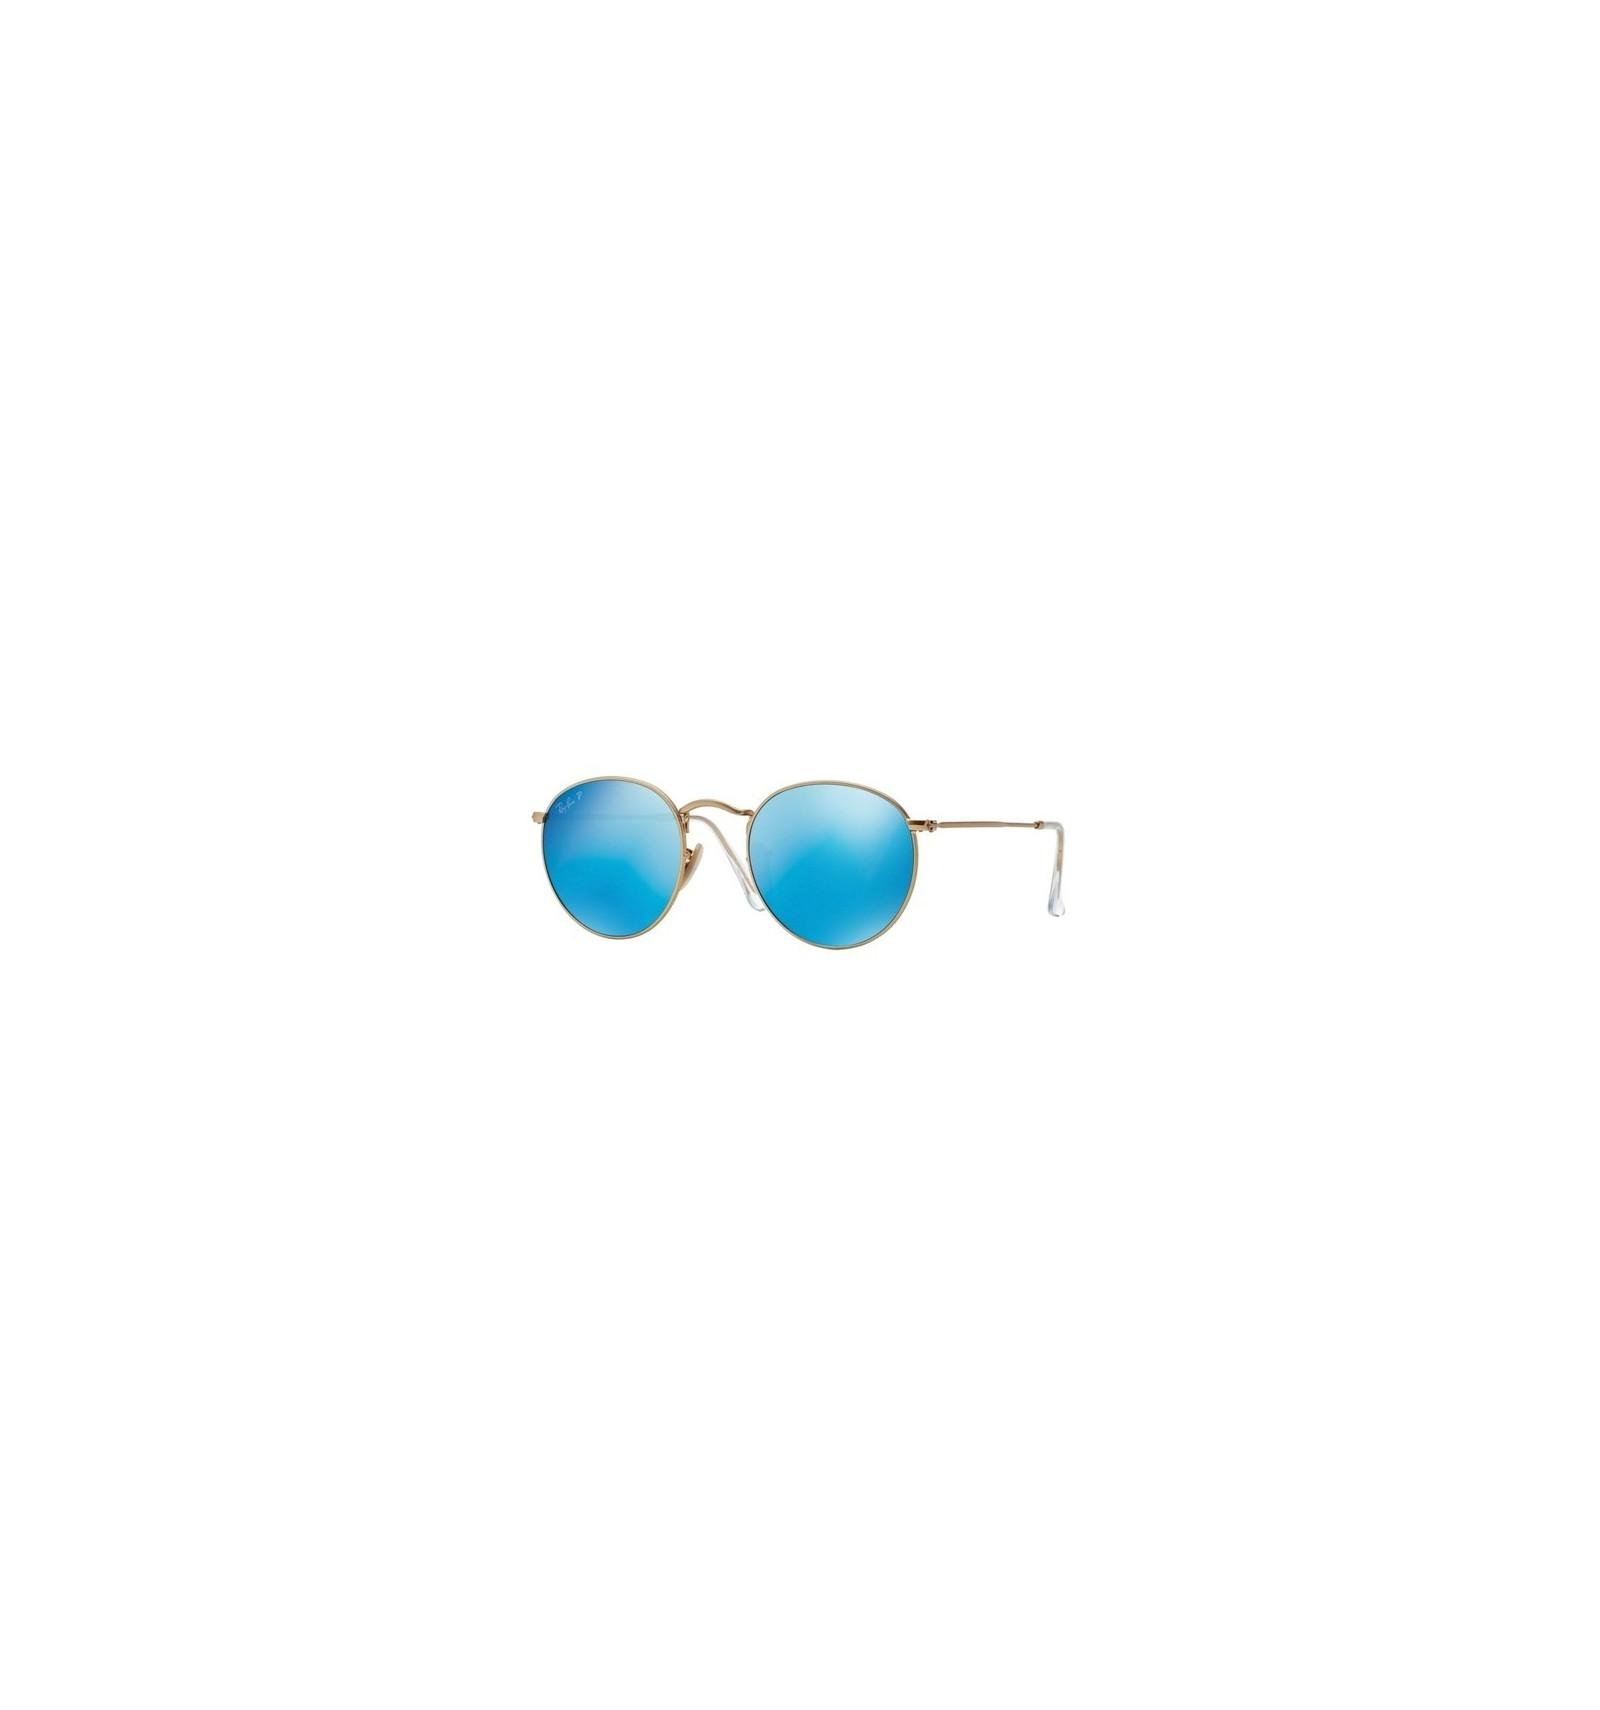 Gafas de sol RAY BAN 4243 Round Matte Black - Optica Sanabre 2fca3e7fe5